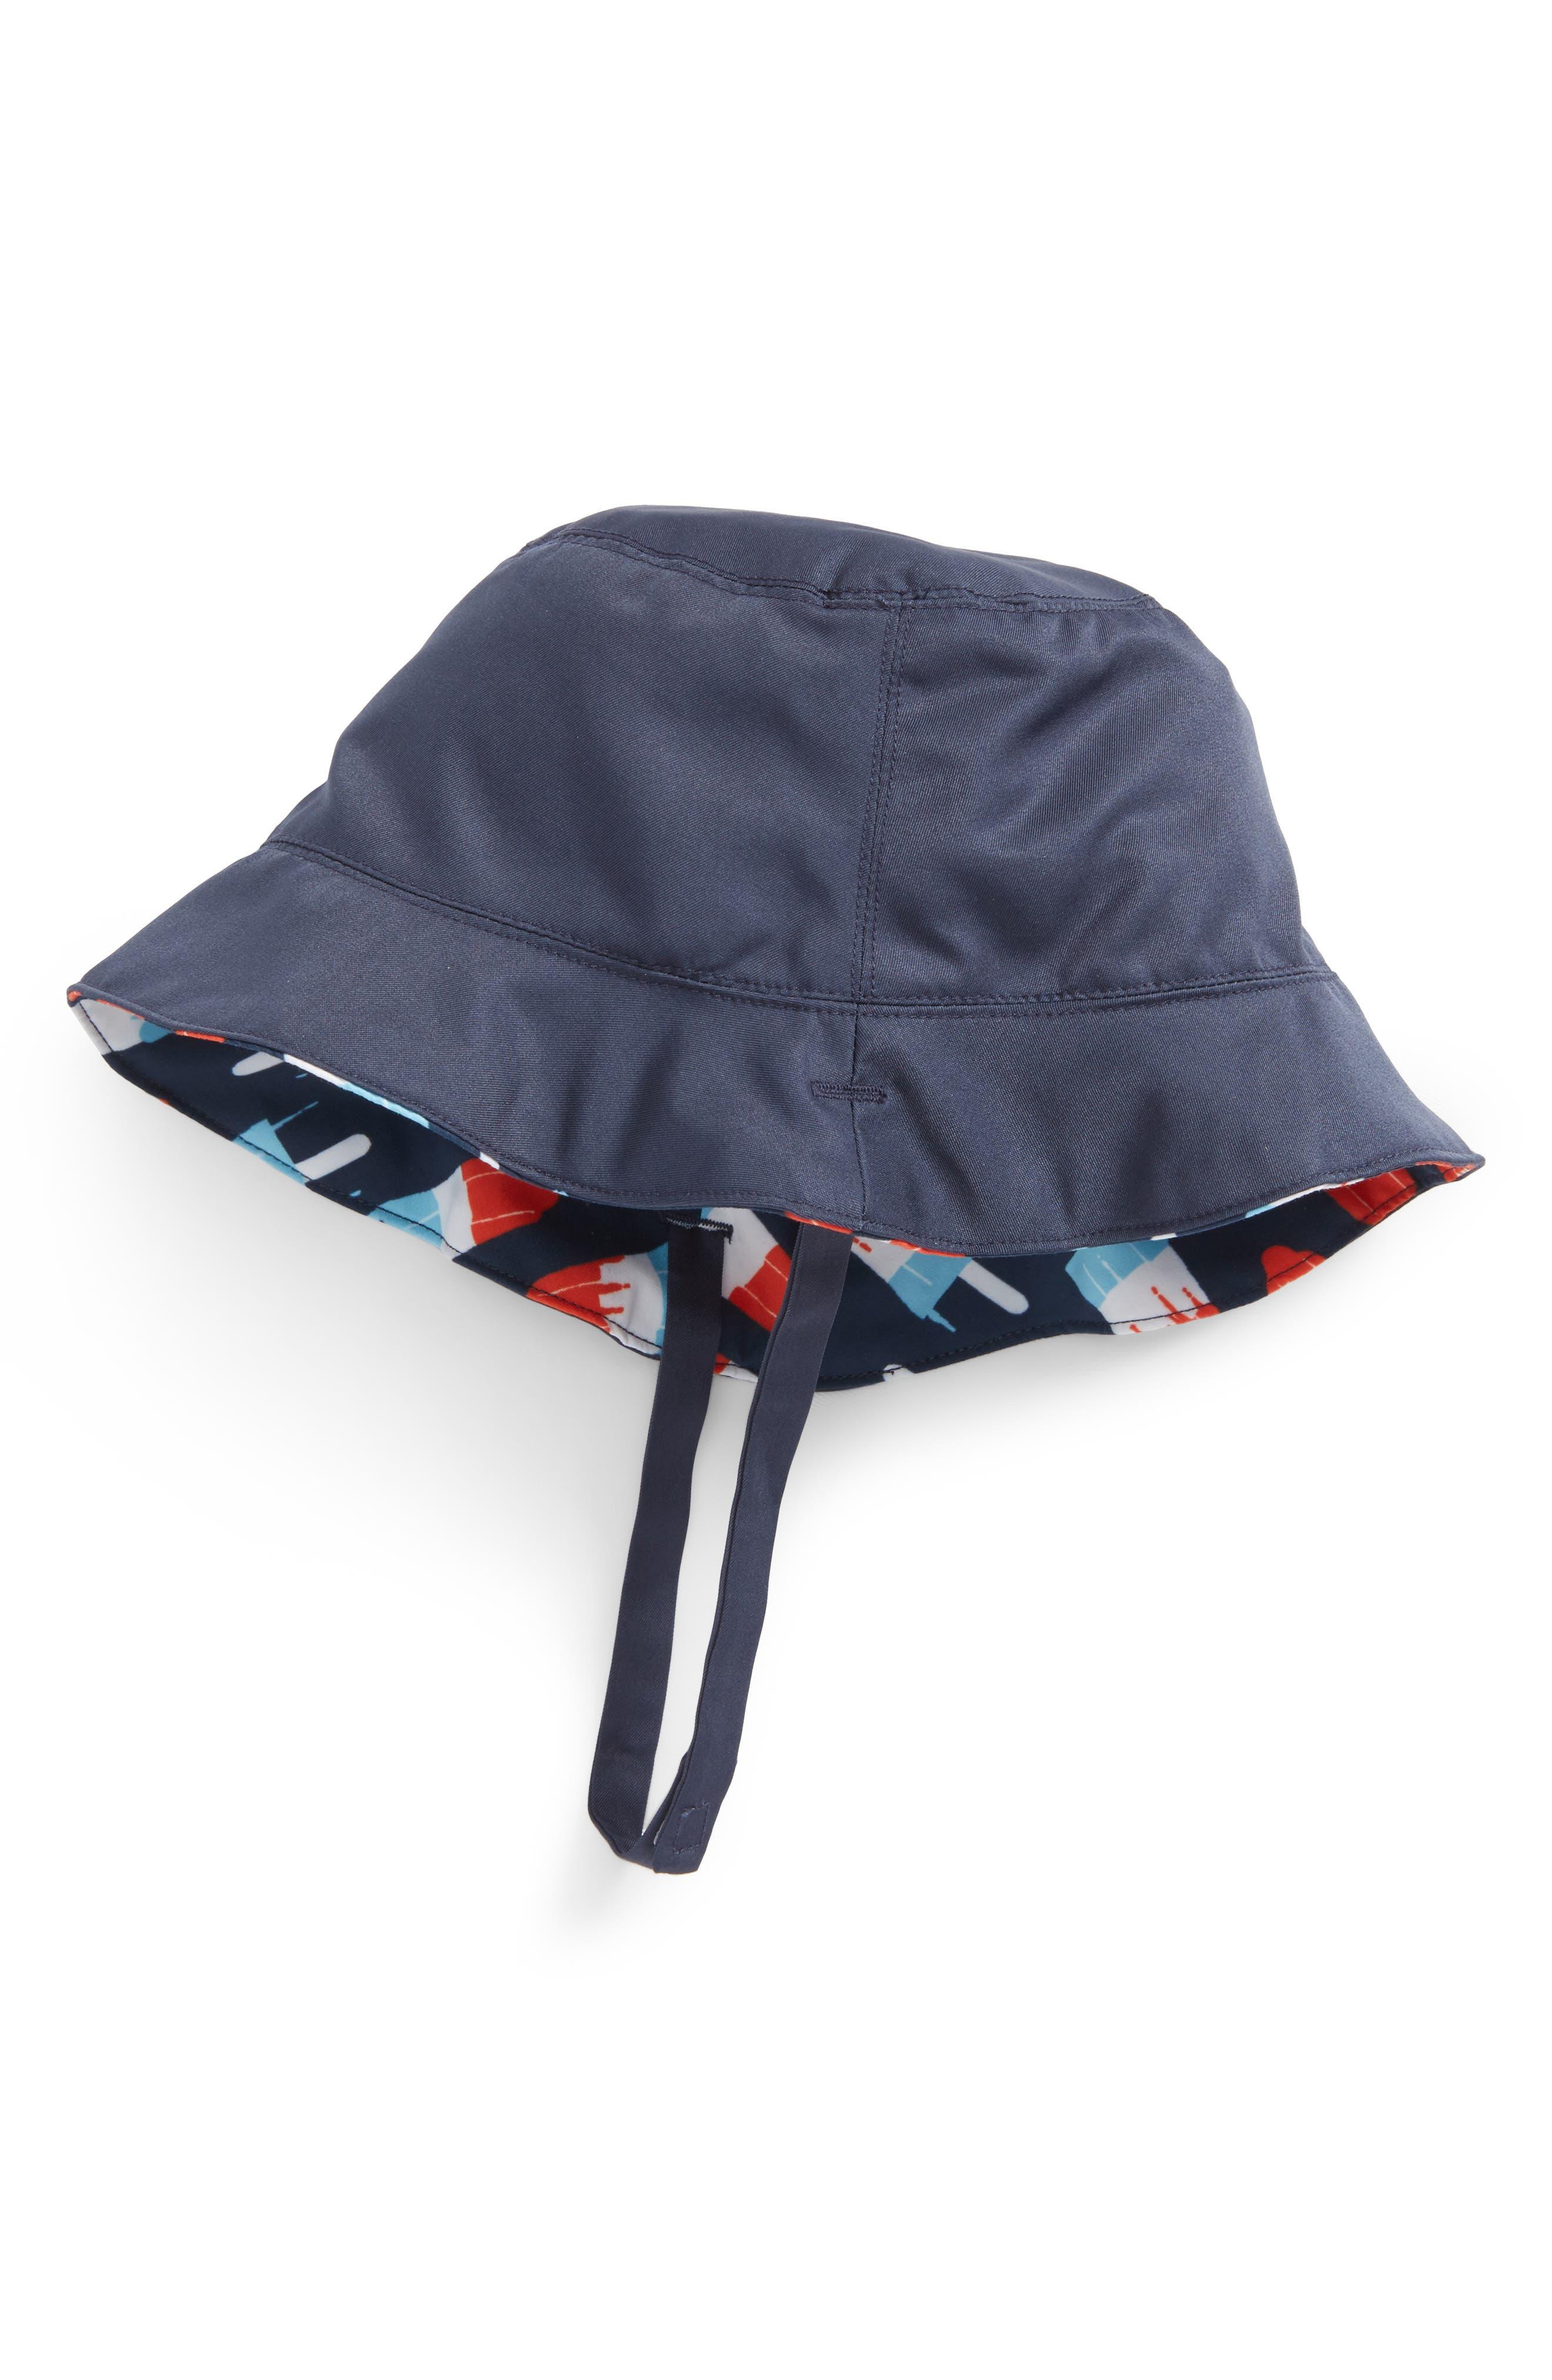 Reversible Bucket Hat,                             Main thumbnail 1, color,                             Navy Dress Popsicles